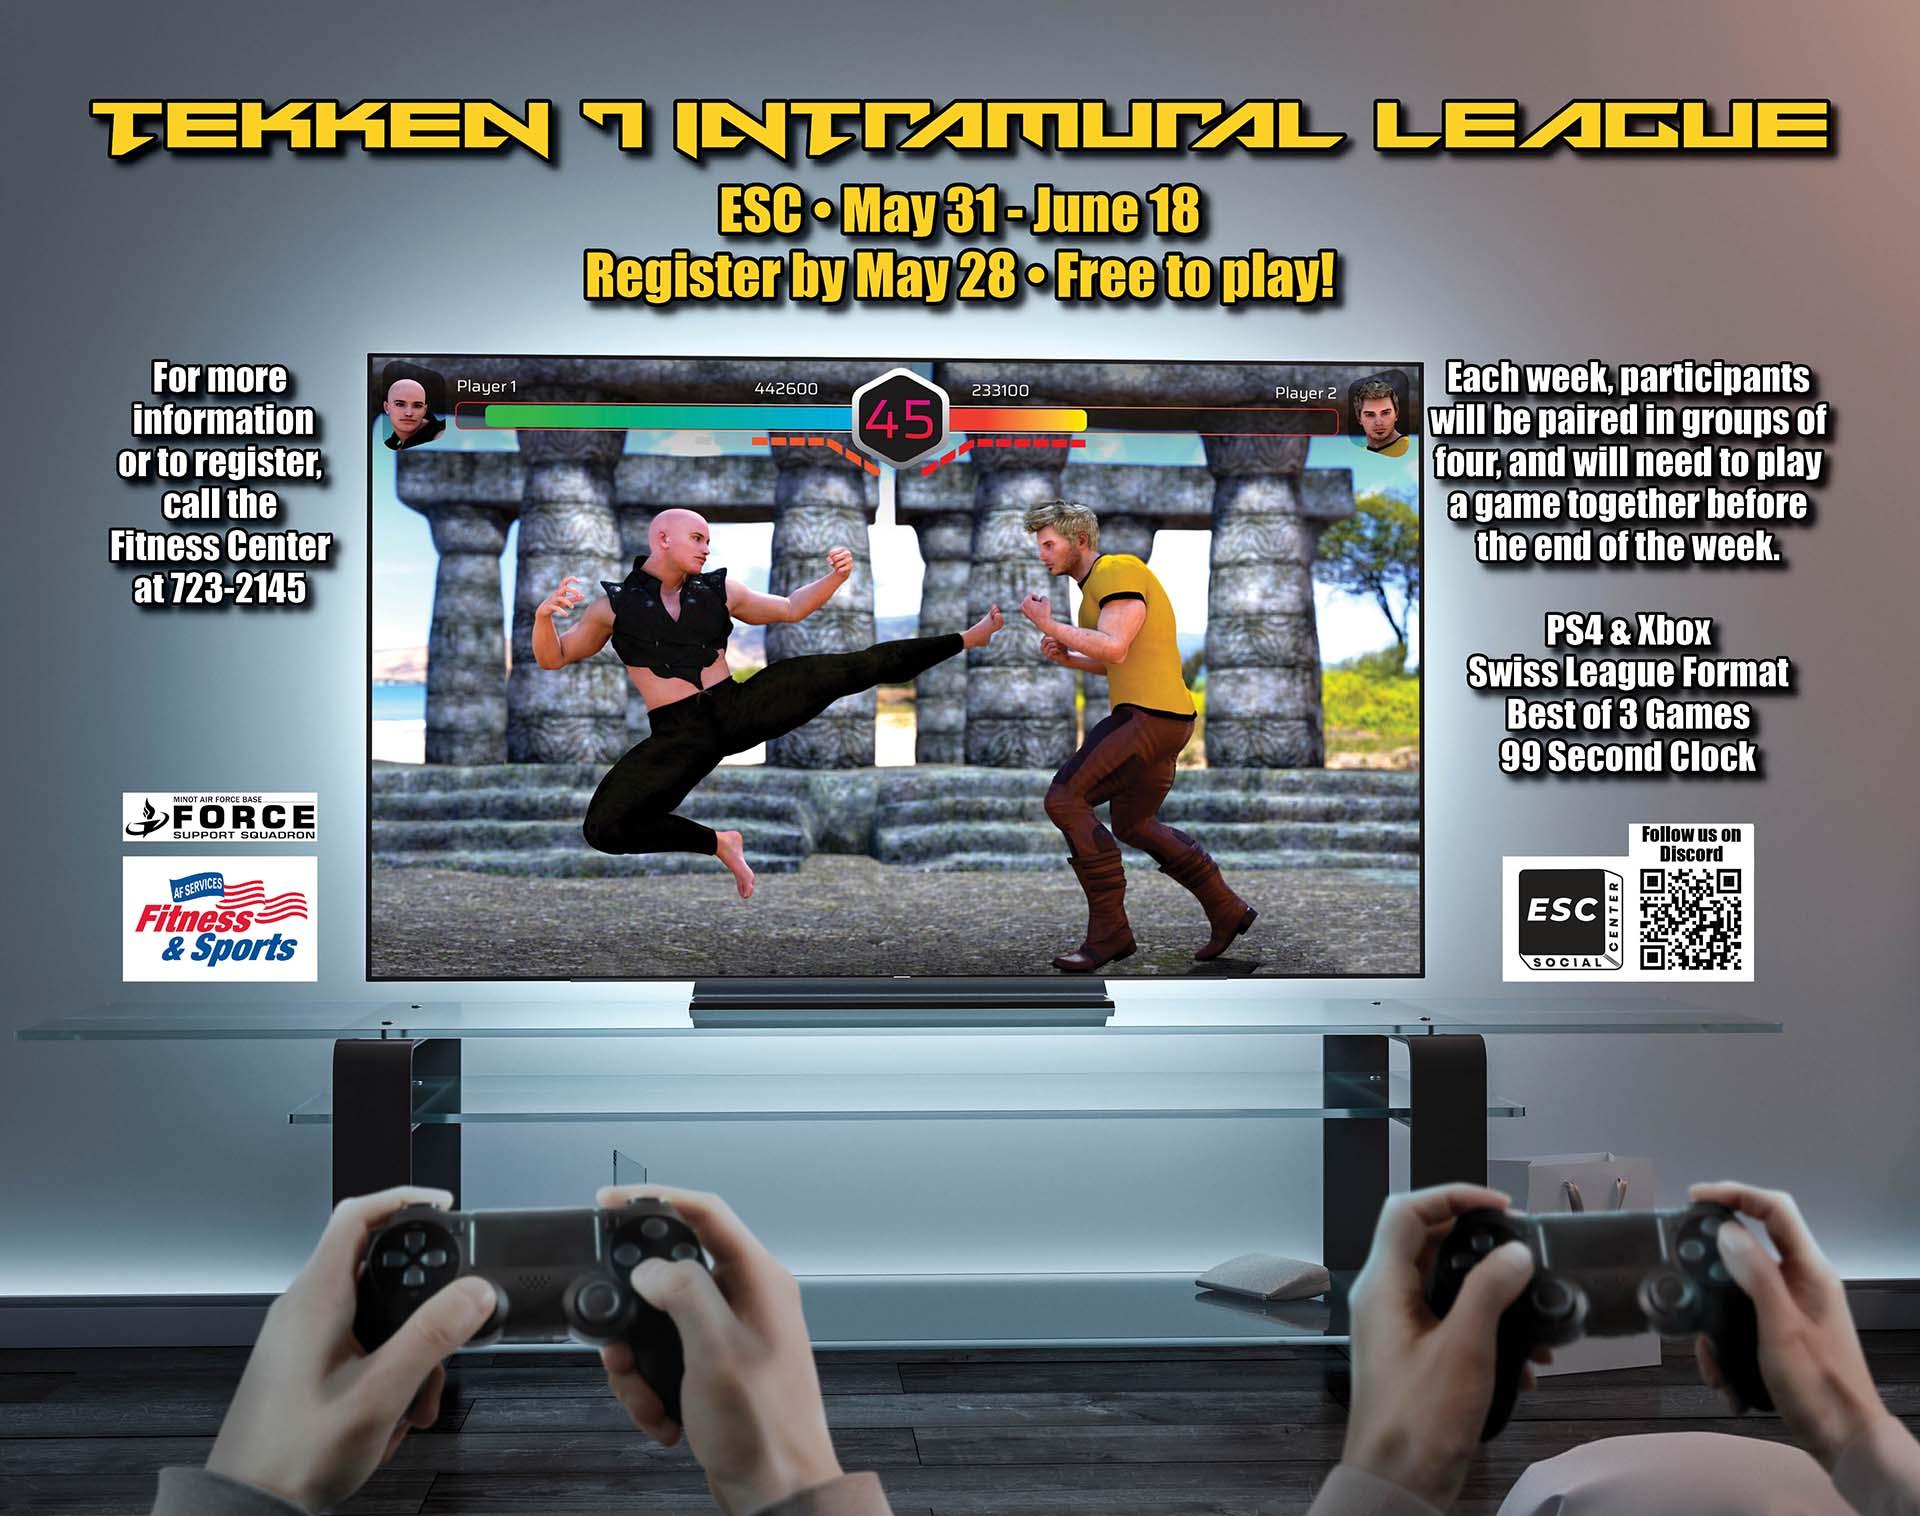 Tekken 7 Intramural League